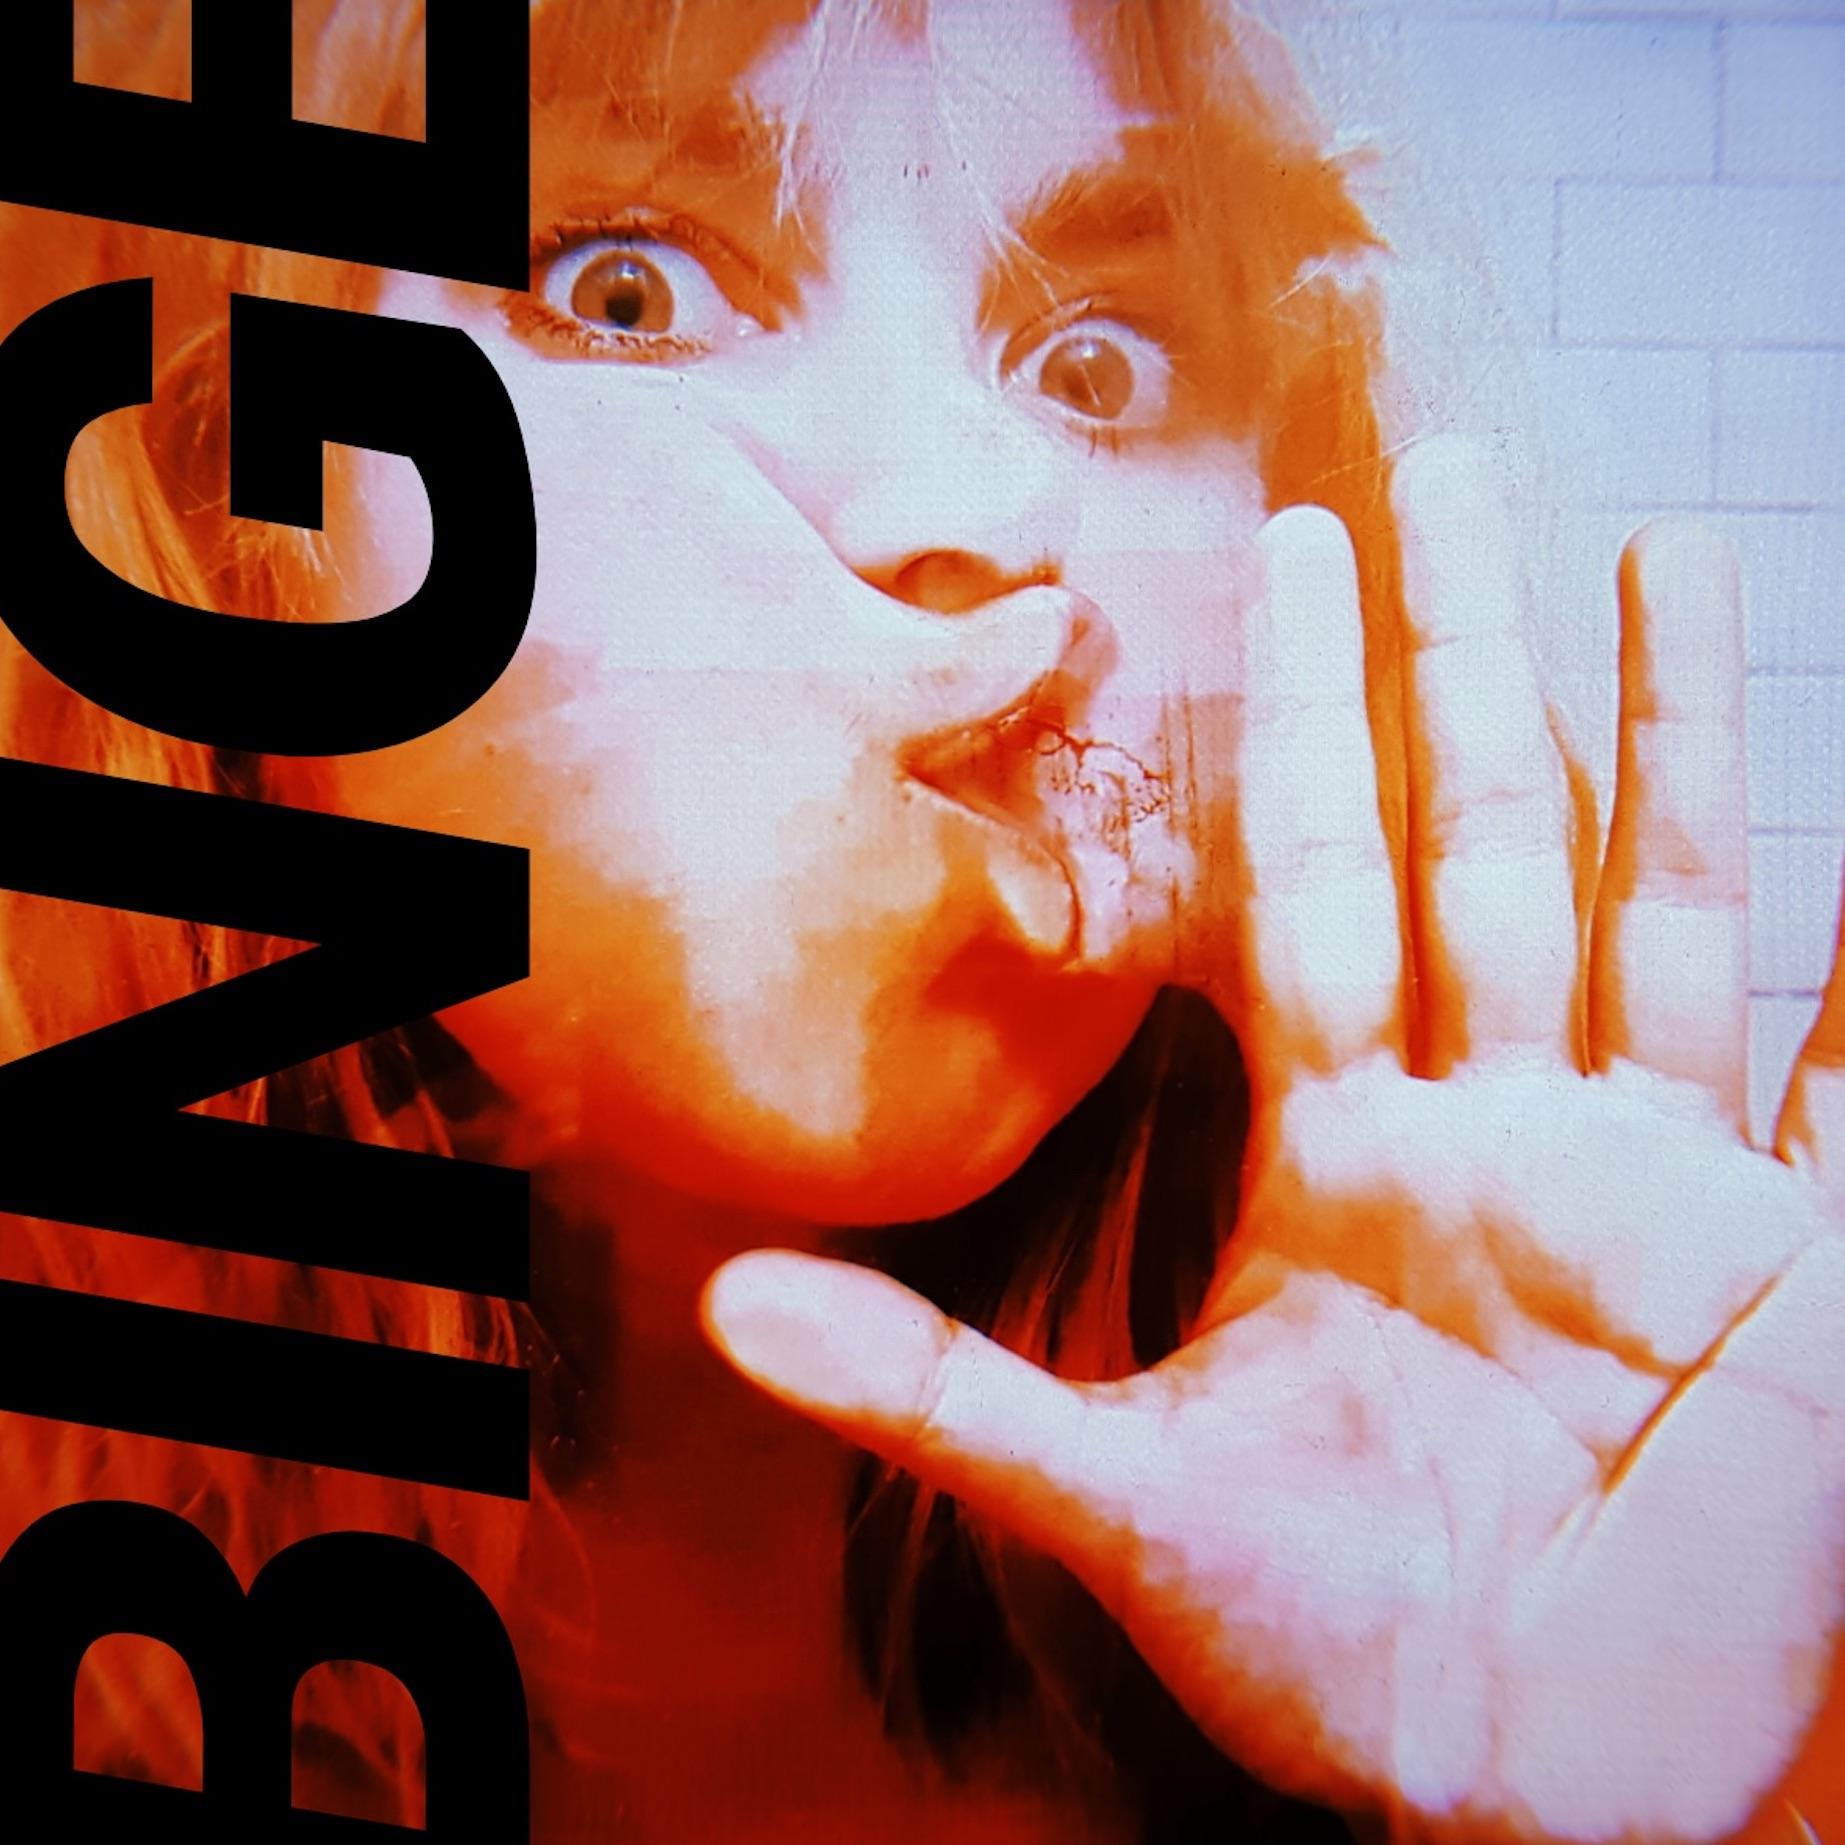 04 Toni Charline show art